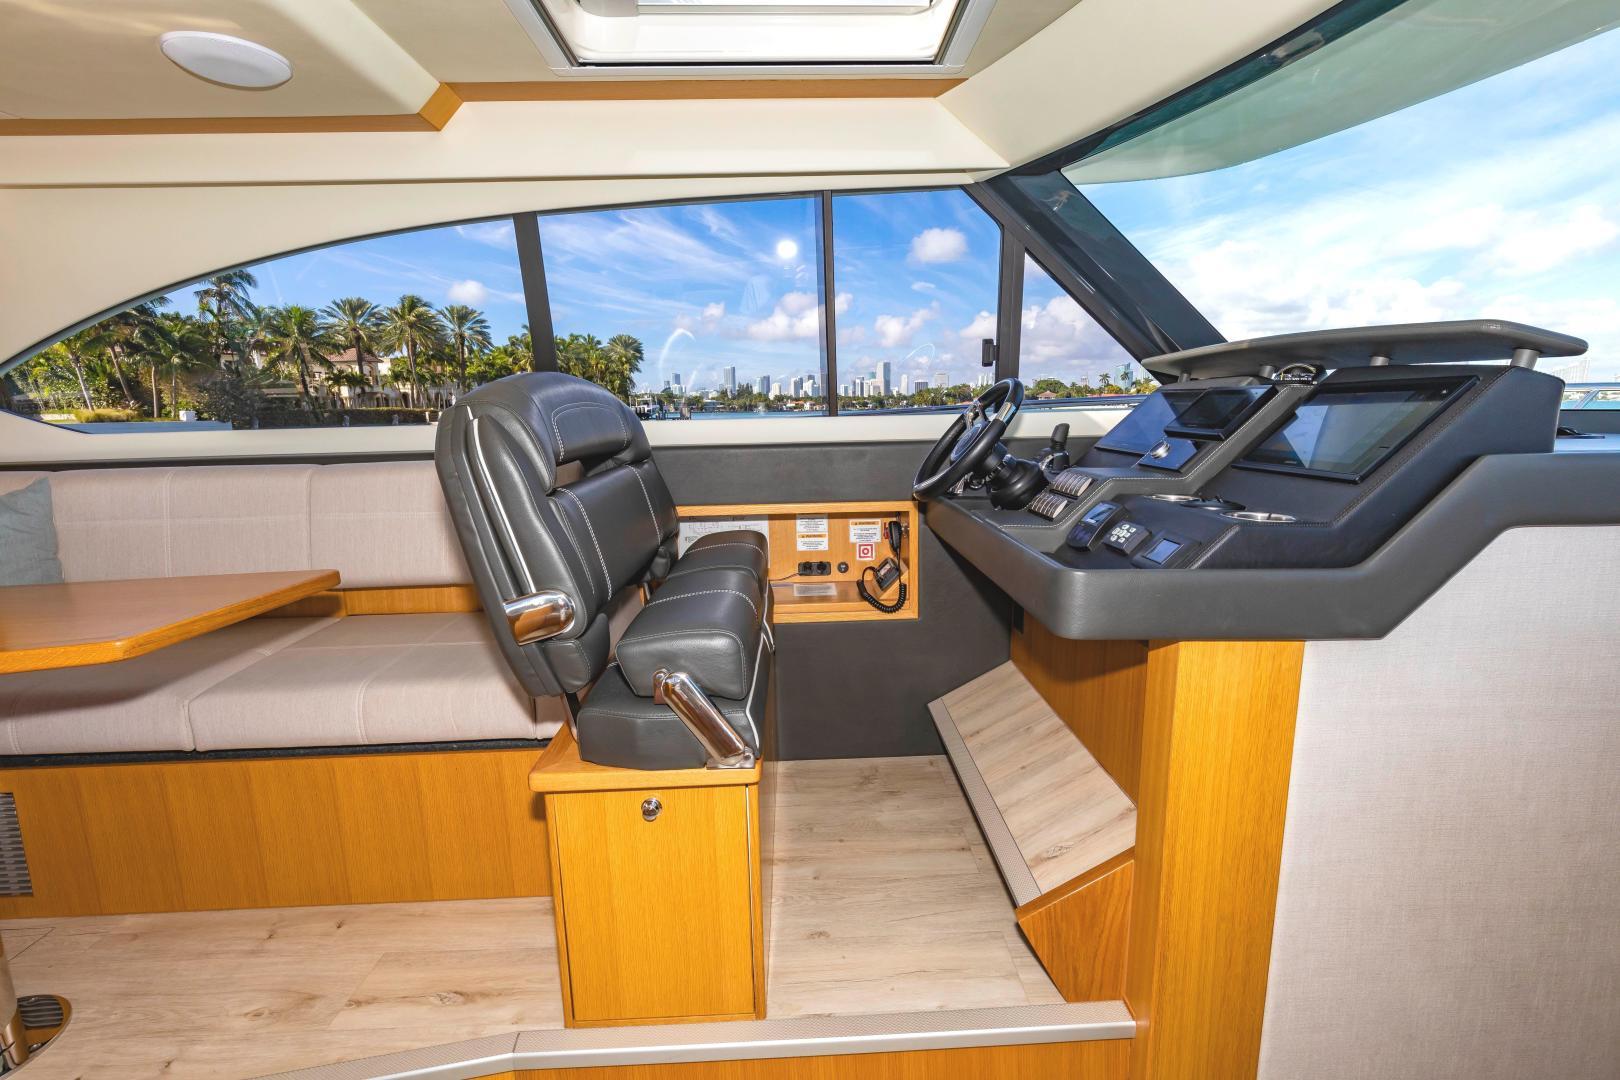 Riviera-395 SUV 2019-Ipanema Miami Beach-Florida-United States-1614905   Thumbnail